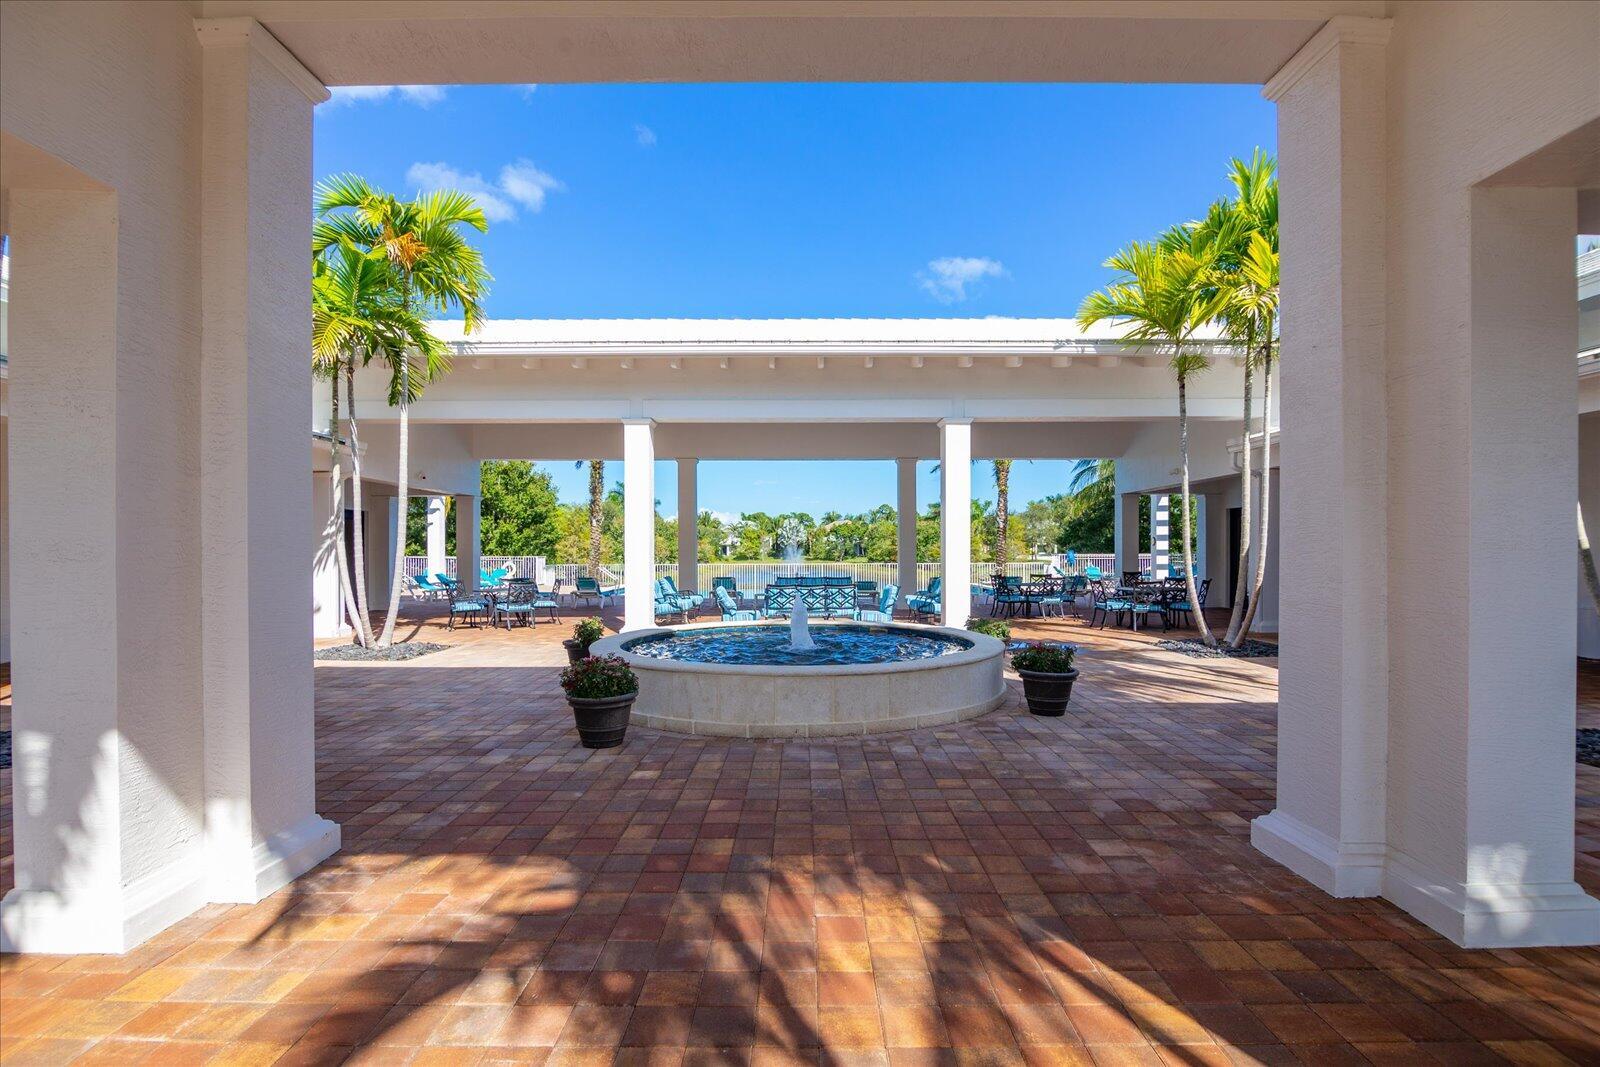 1064 Piccadilly Street - 33418 - FL - Palm Beach Gardens